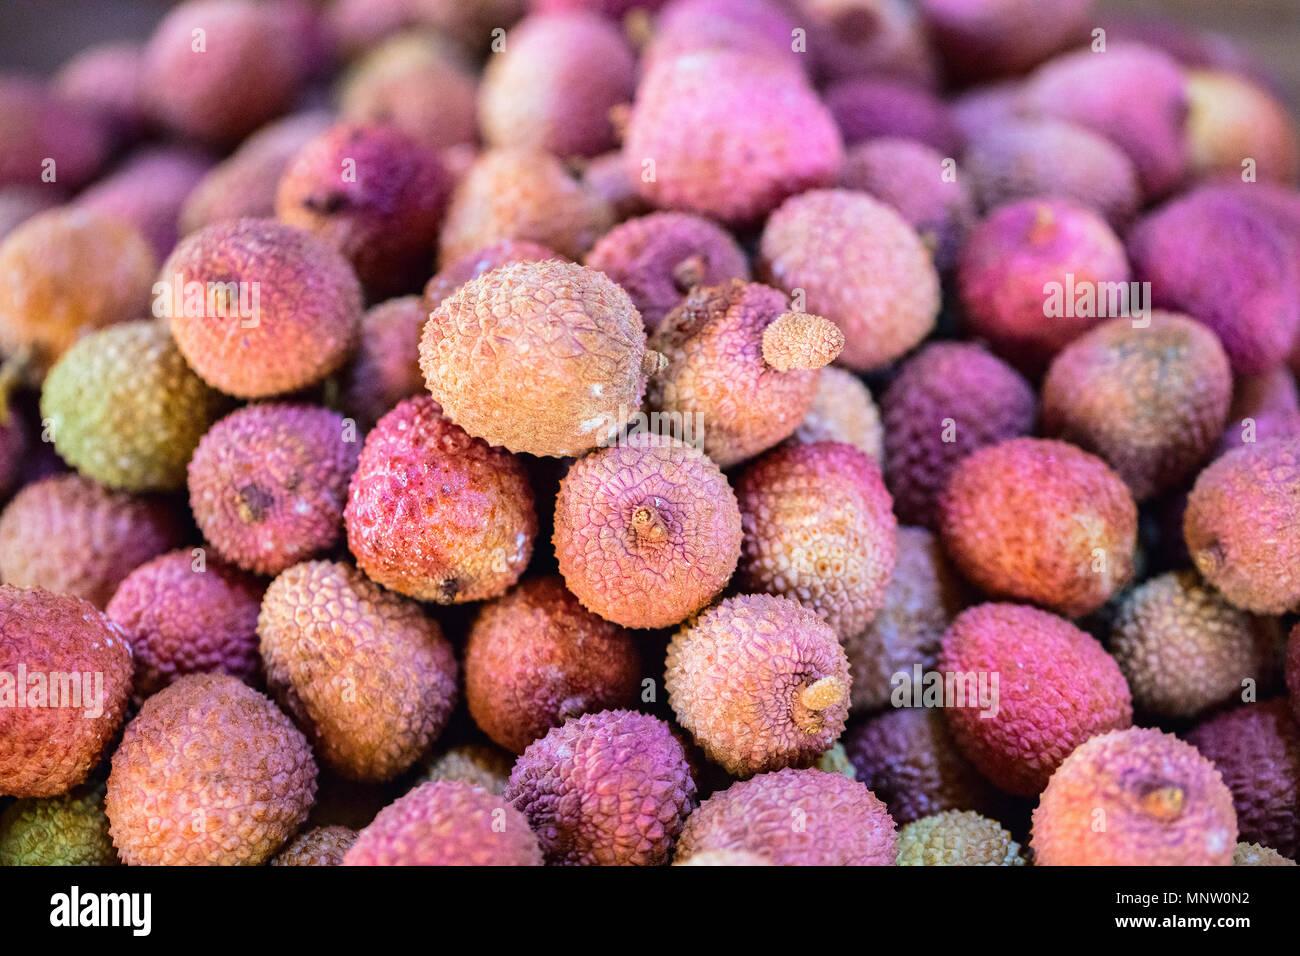 Sortiment an frischem Obst am Marktstand Stockbild